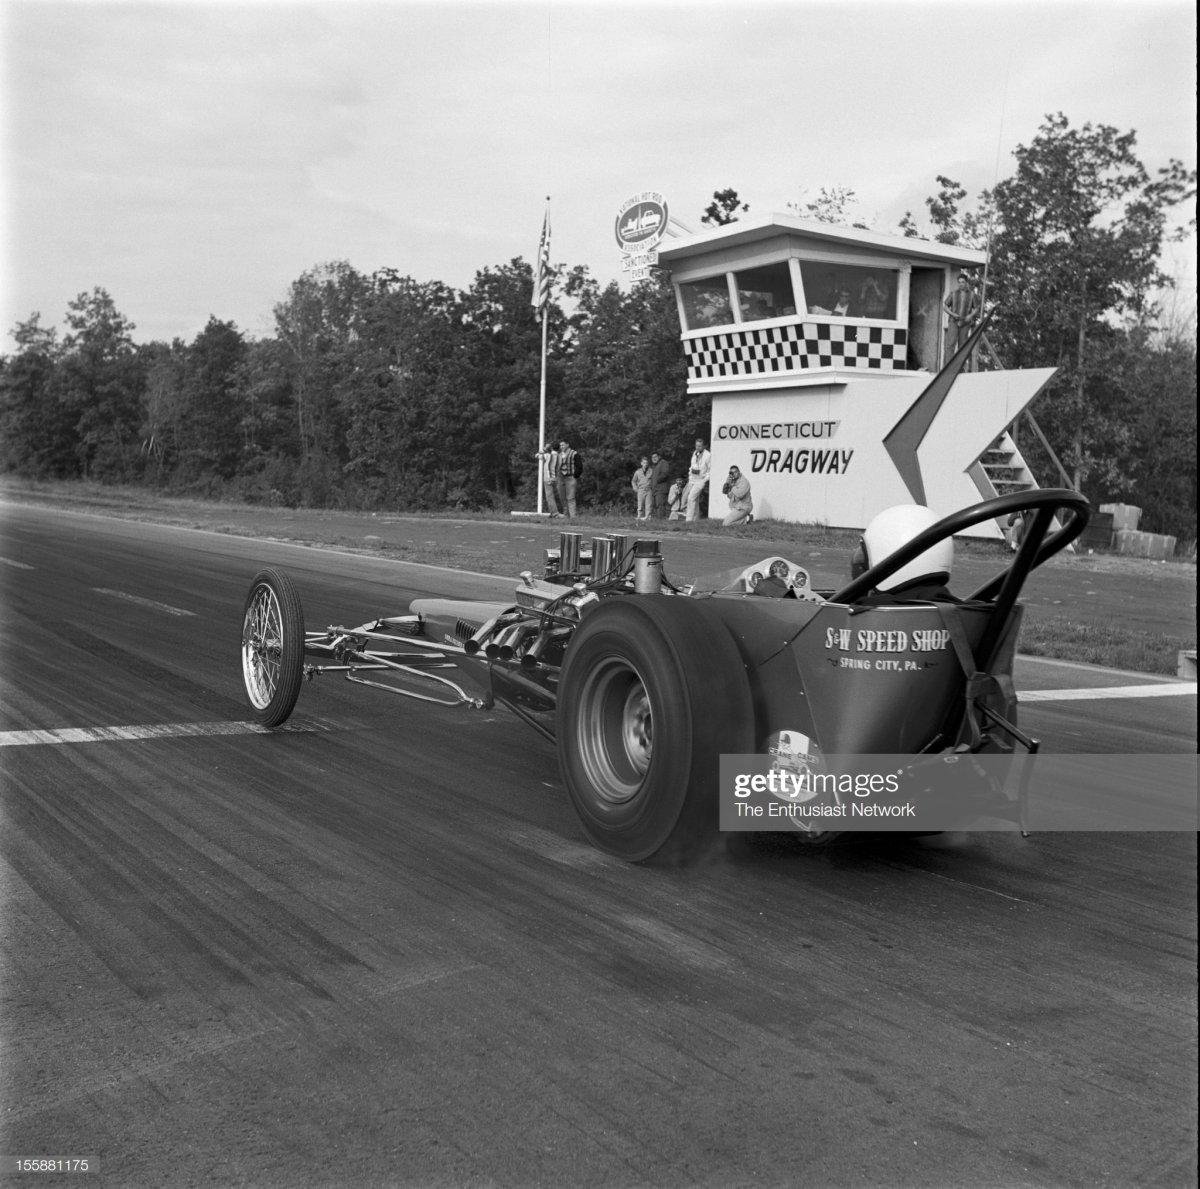 44 Connecticut Dragway Races.jpg